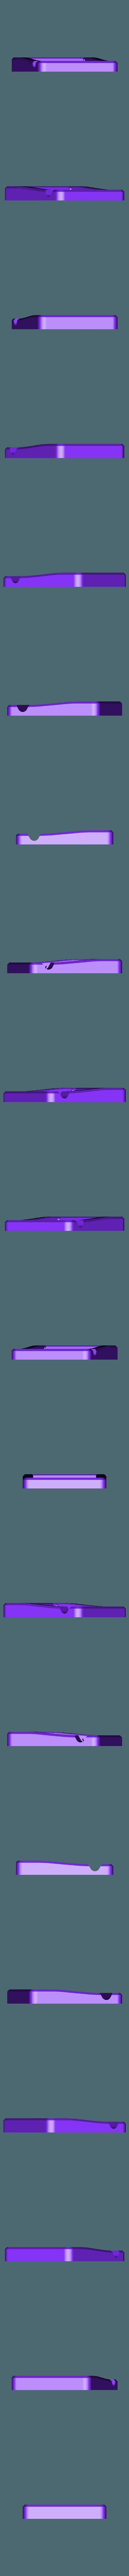 BaseEsterna.stl Download free STL file Adjustable Laptop Stand [WIP] • 3D printable template, Kliffom